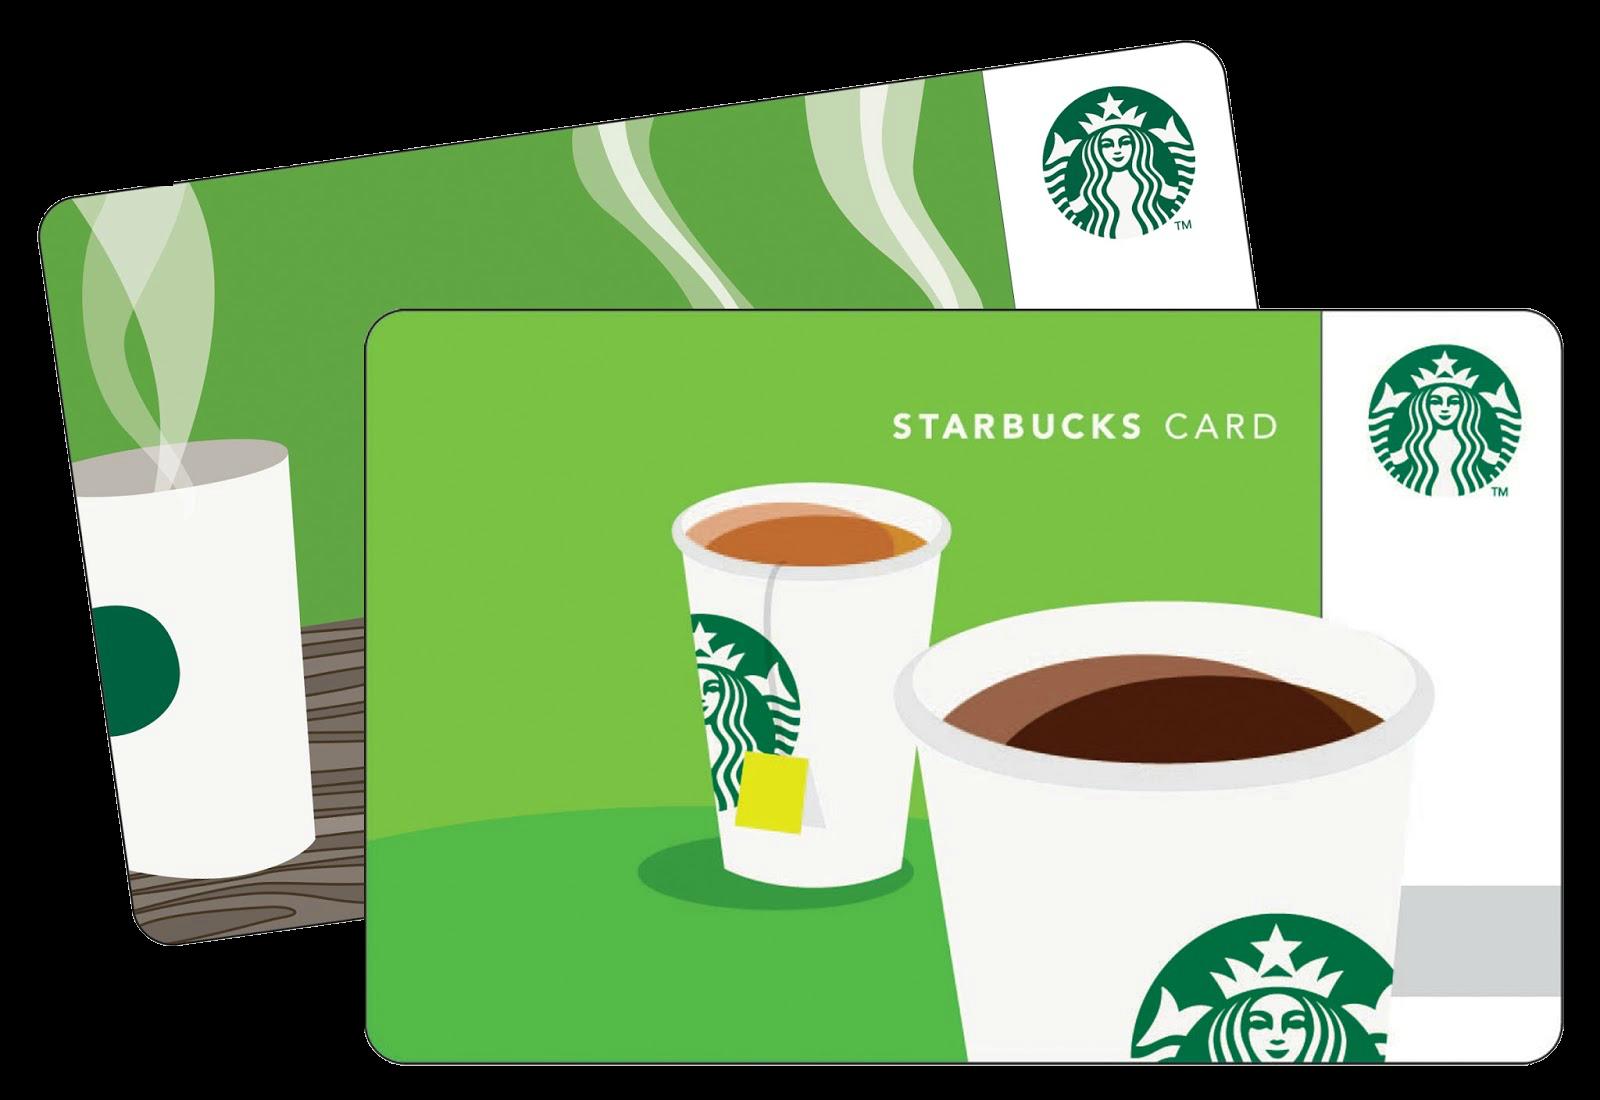 Coupon clipart money. Starbucks buy one gift